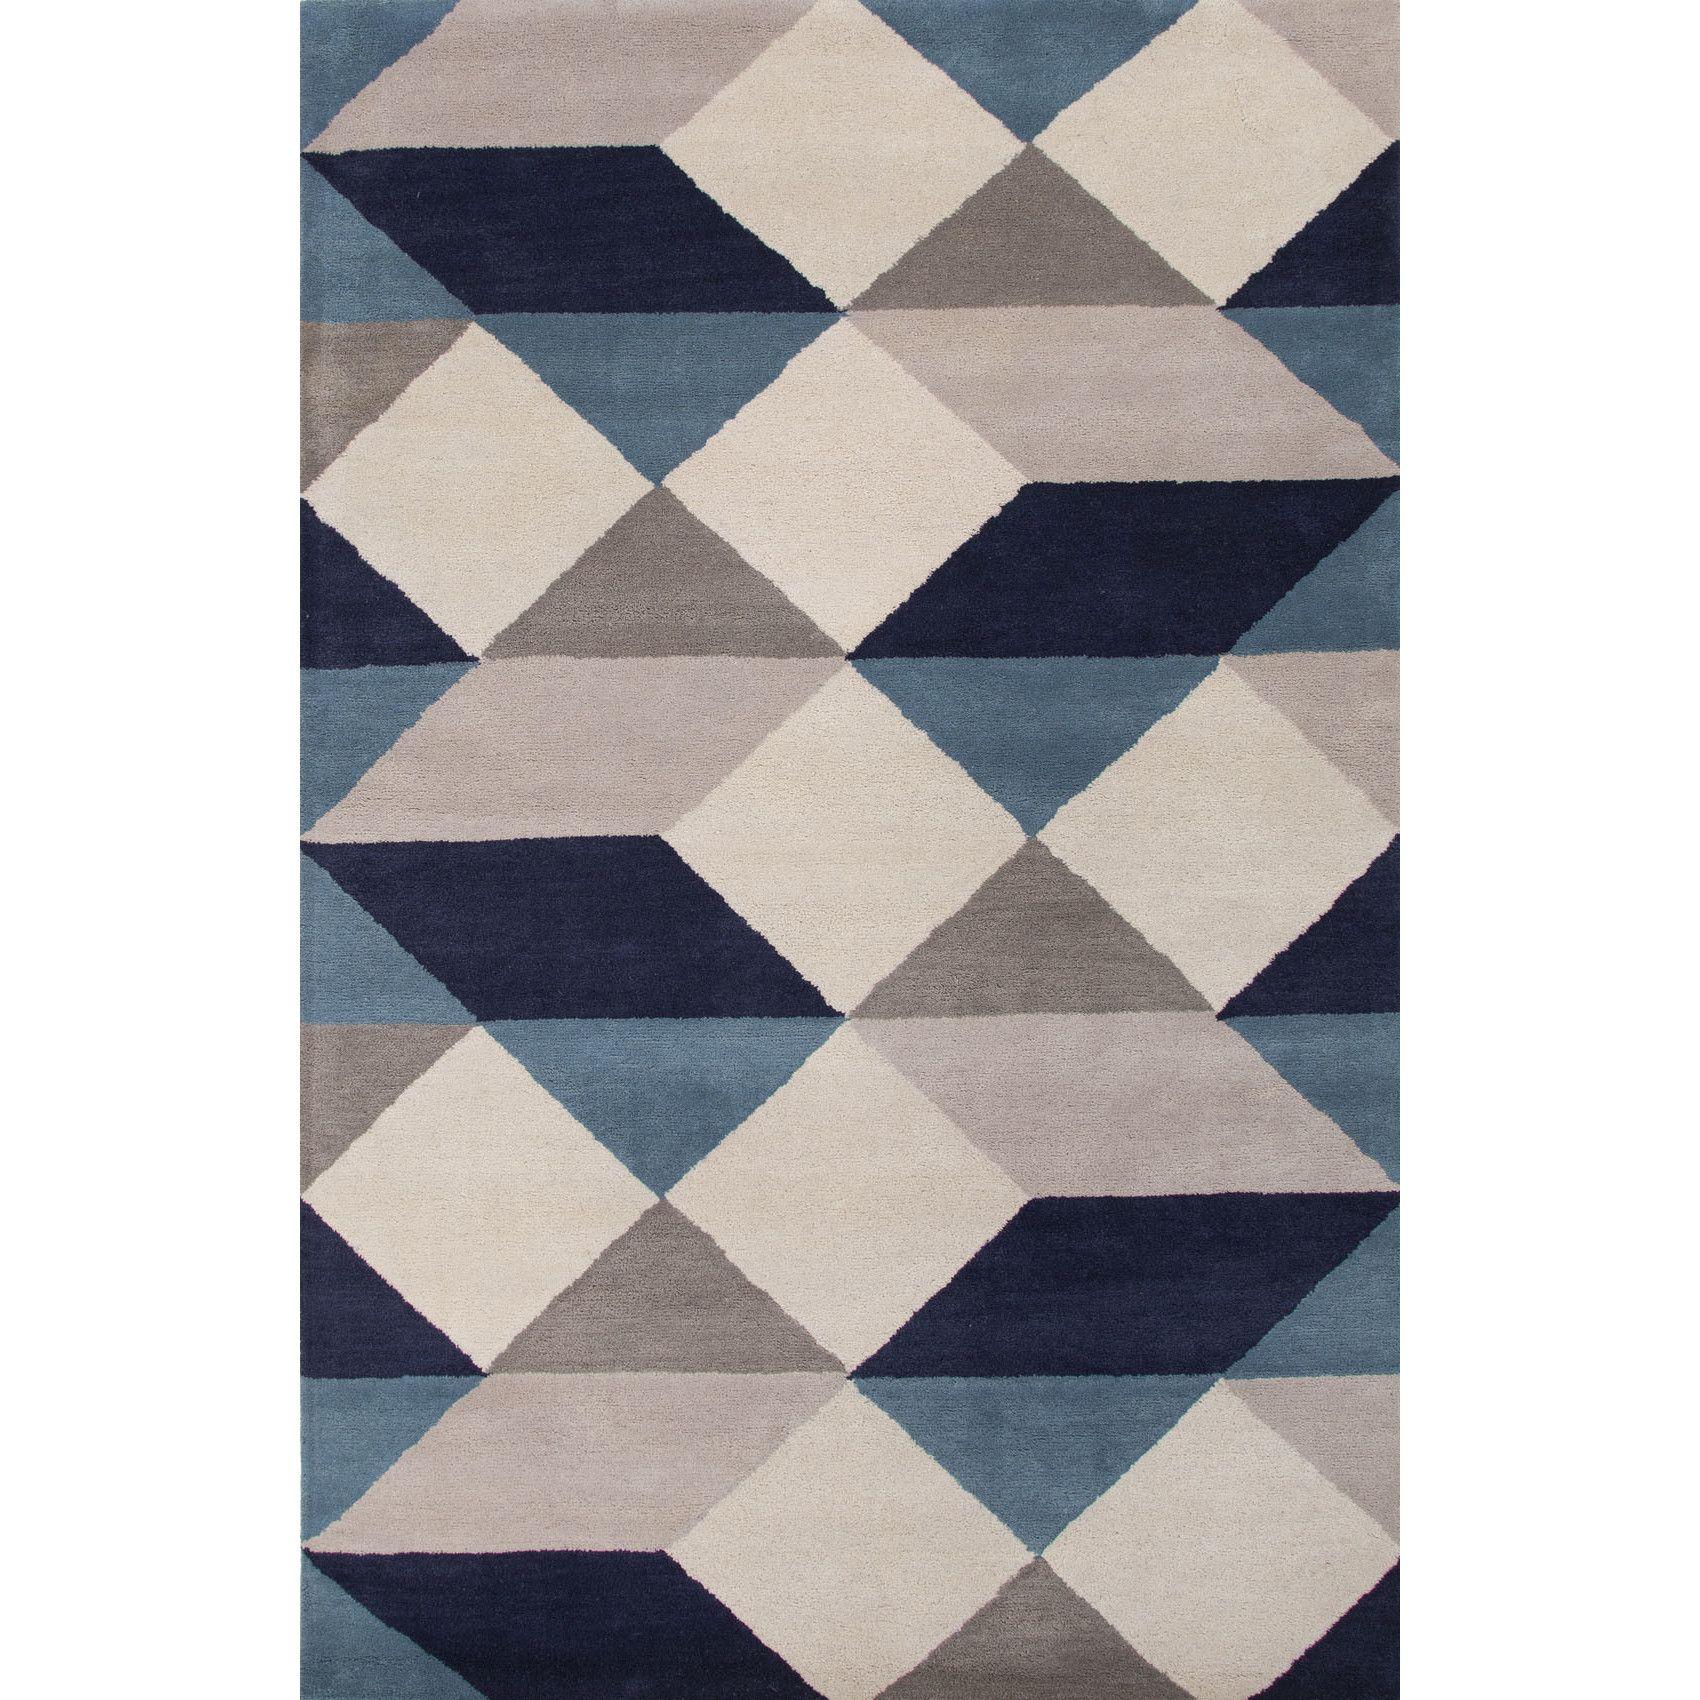 jaipur living en casa gray  blue geometric area rug  szÖnyeg  - jaipur living en casa gray  blue geometric area rug